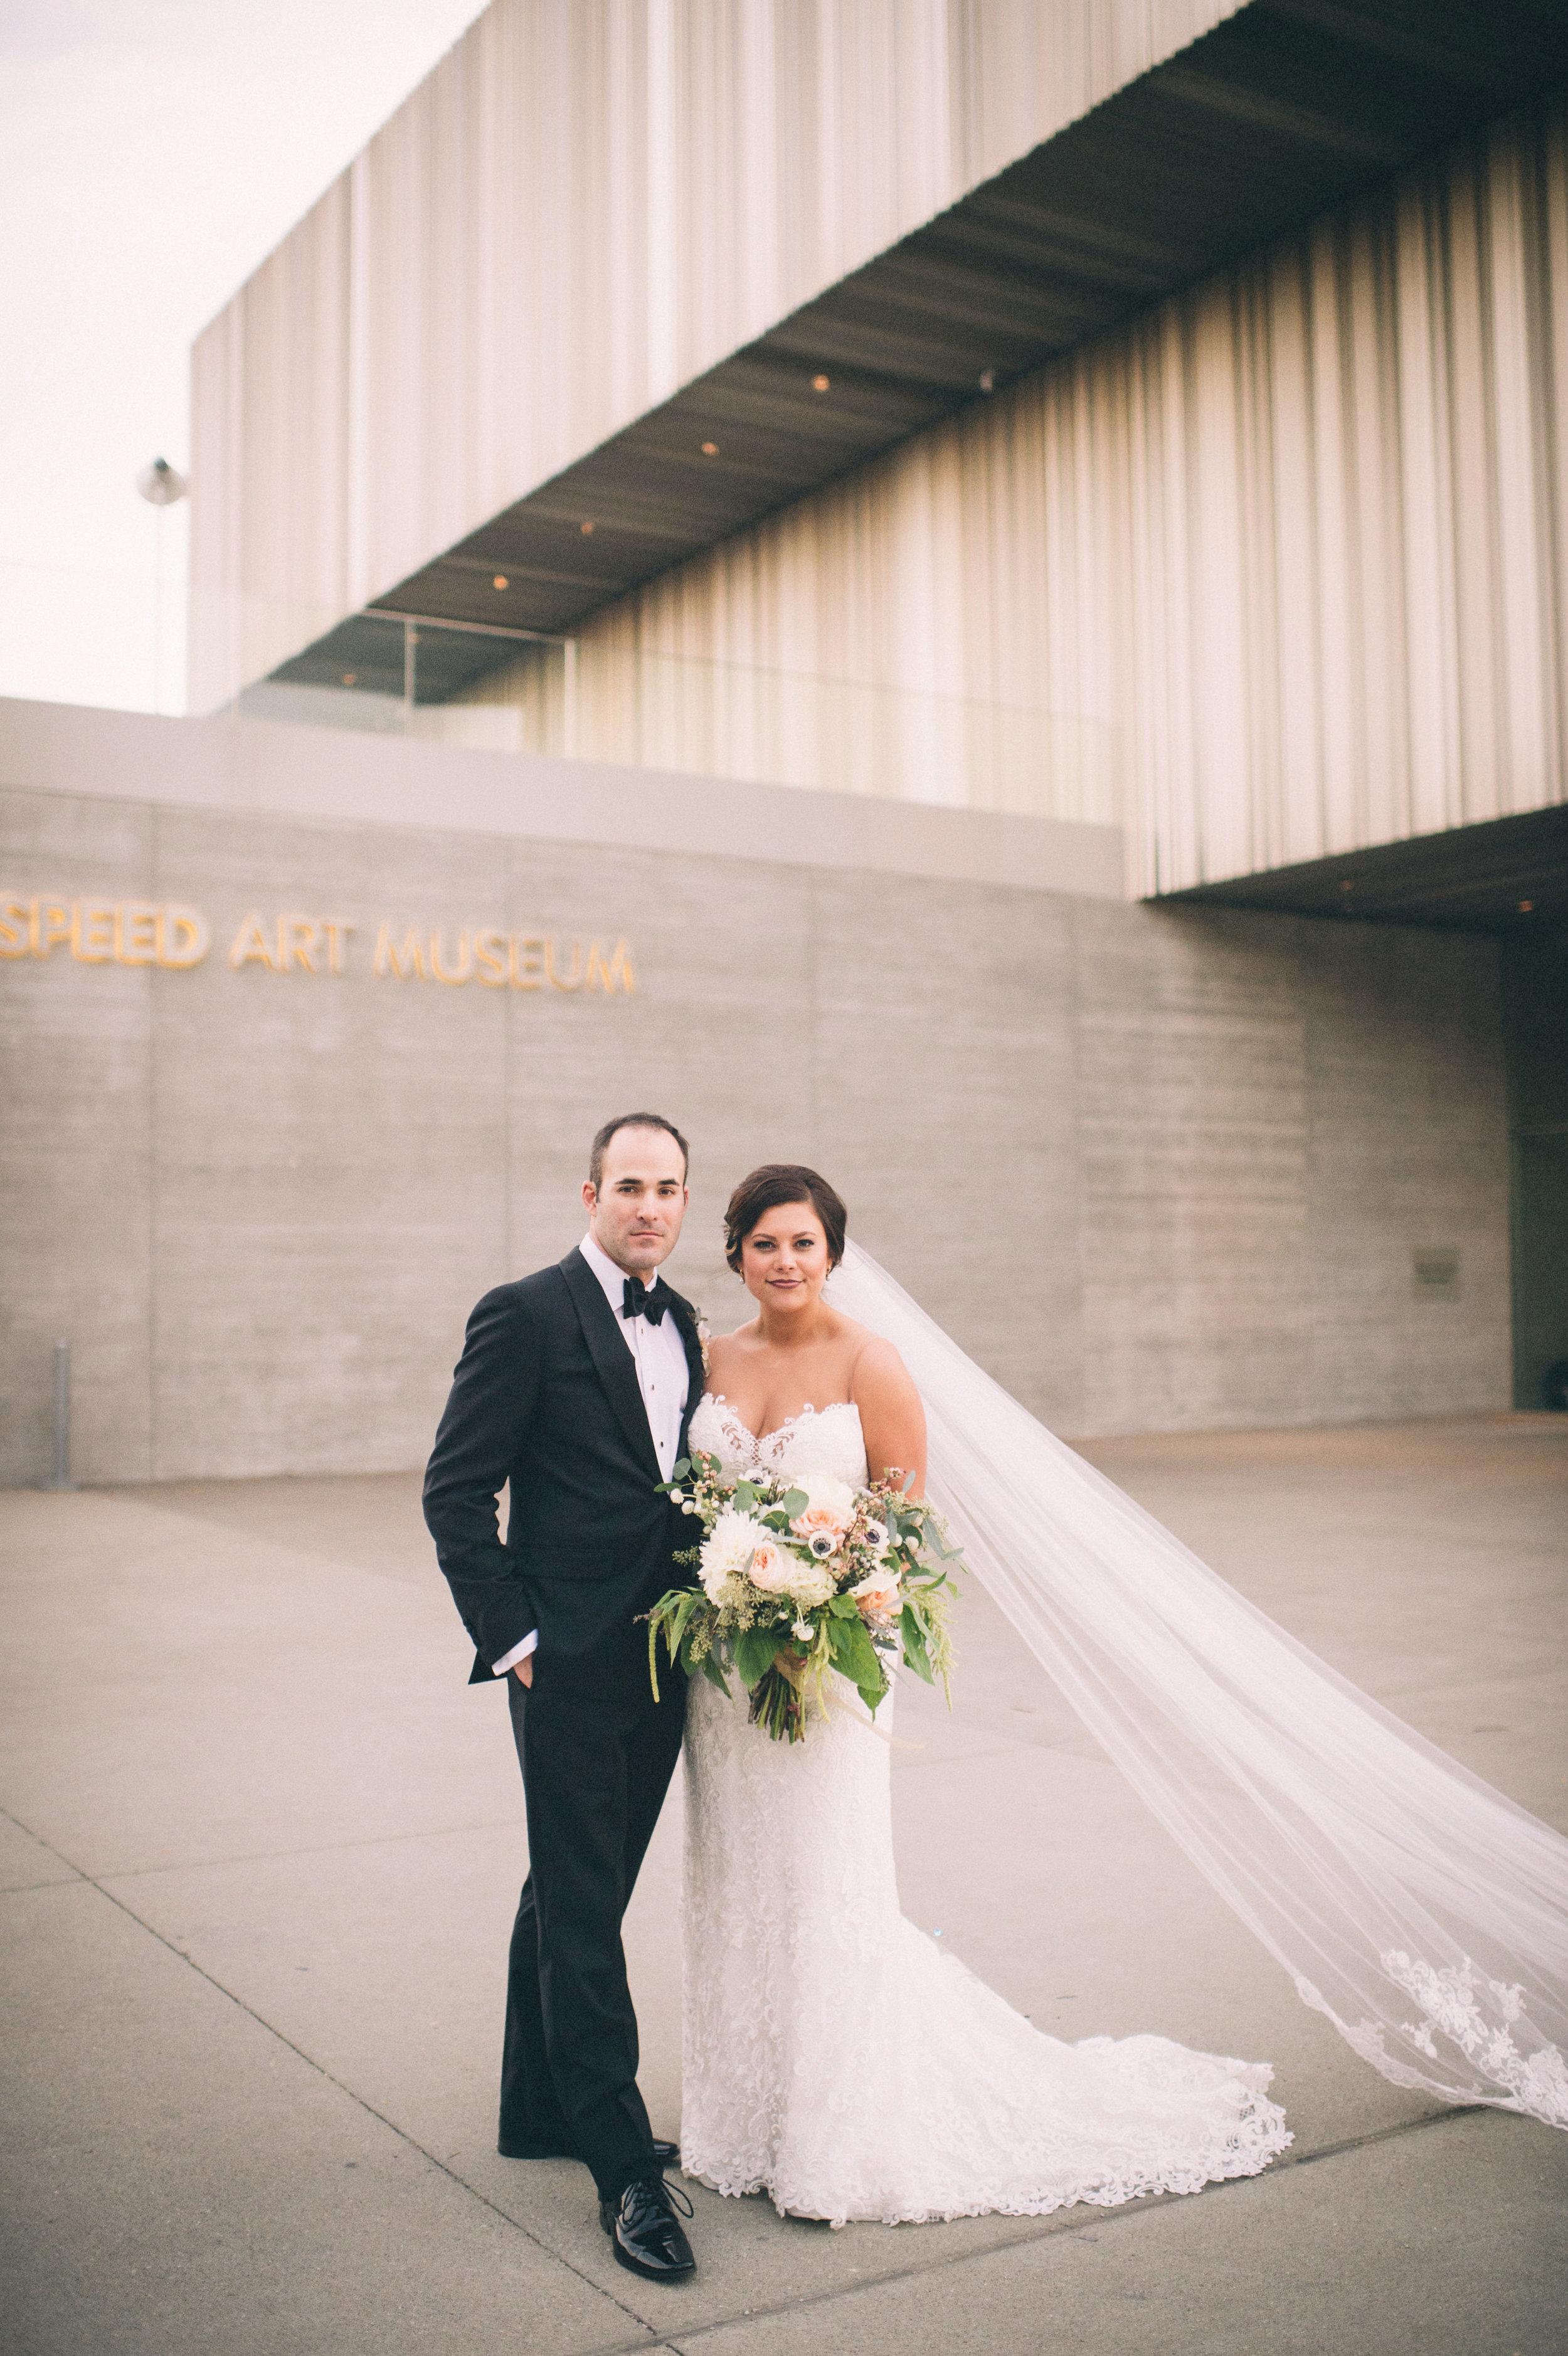 Sarah Katherine Davis Photography - Speed Art Museum Modern Wedding Photographer - Louisville Kentucky Wedding - Elopement